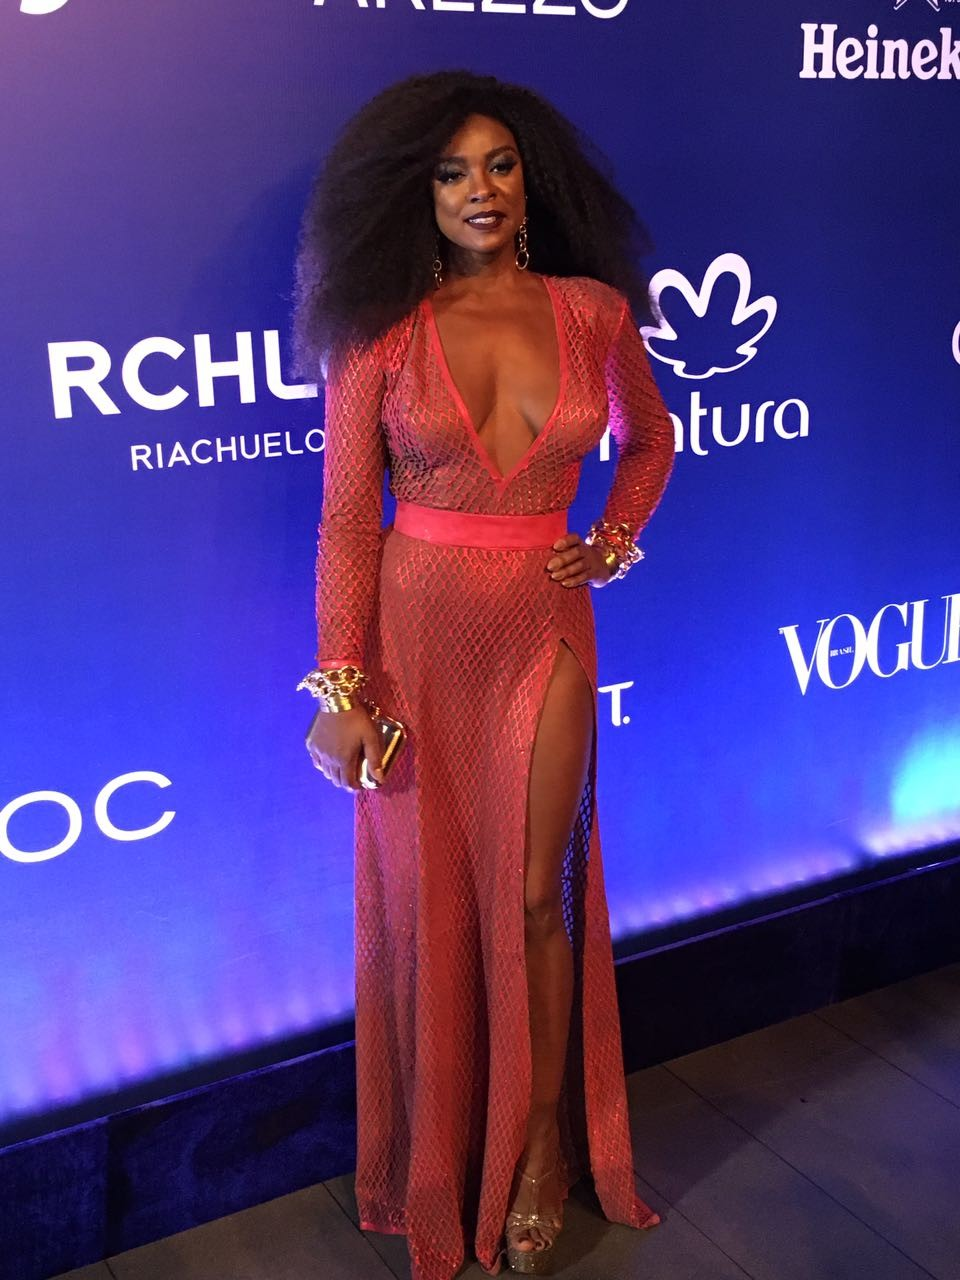 Baile da Vogue (Foto: Glamour)